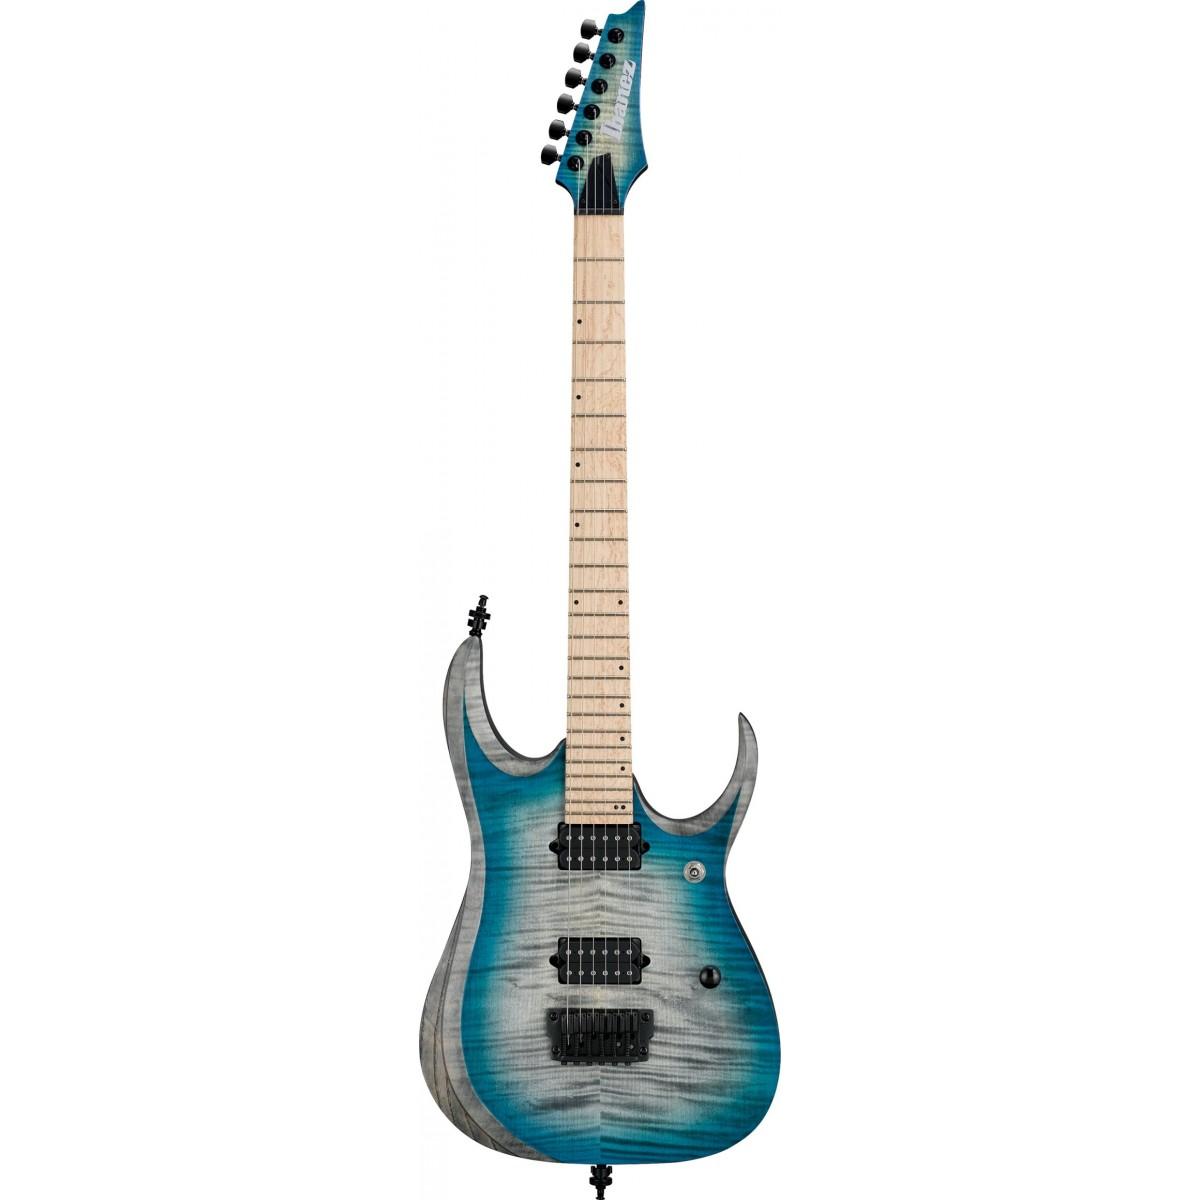 ibanez rgd61al ssb electric guitar stained sapphire blue burst 2019. Black Bedroom Furniture Sets. Home Design Ideas